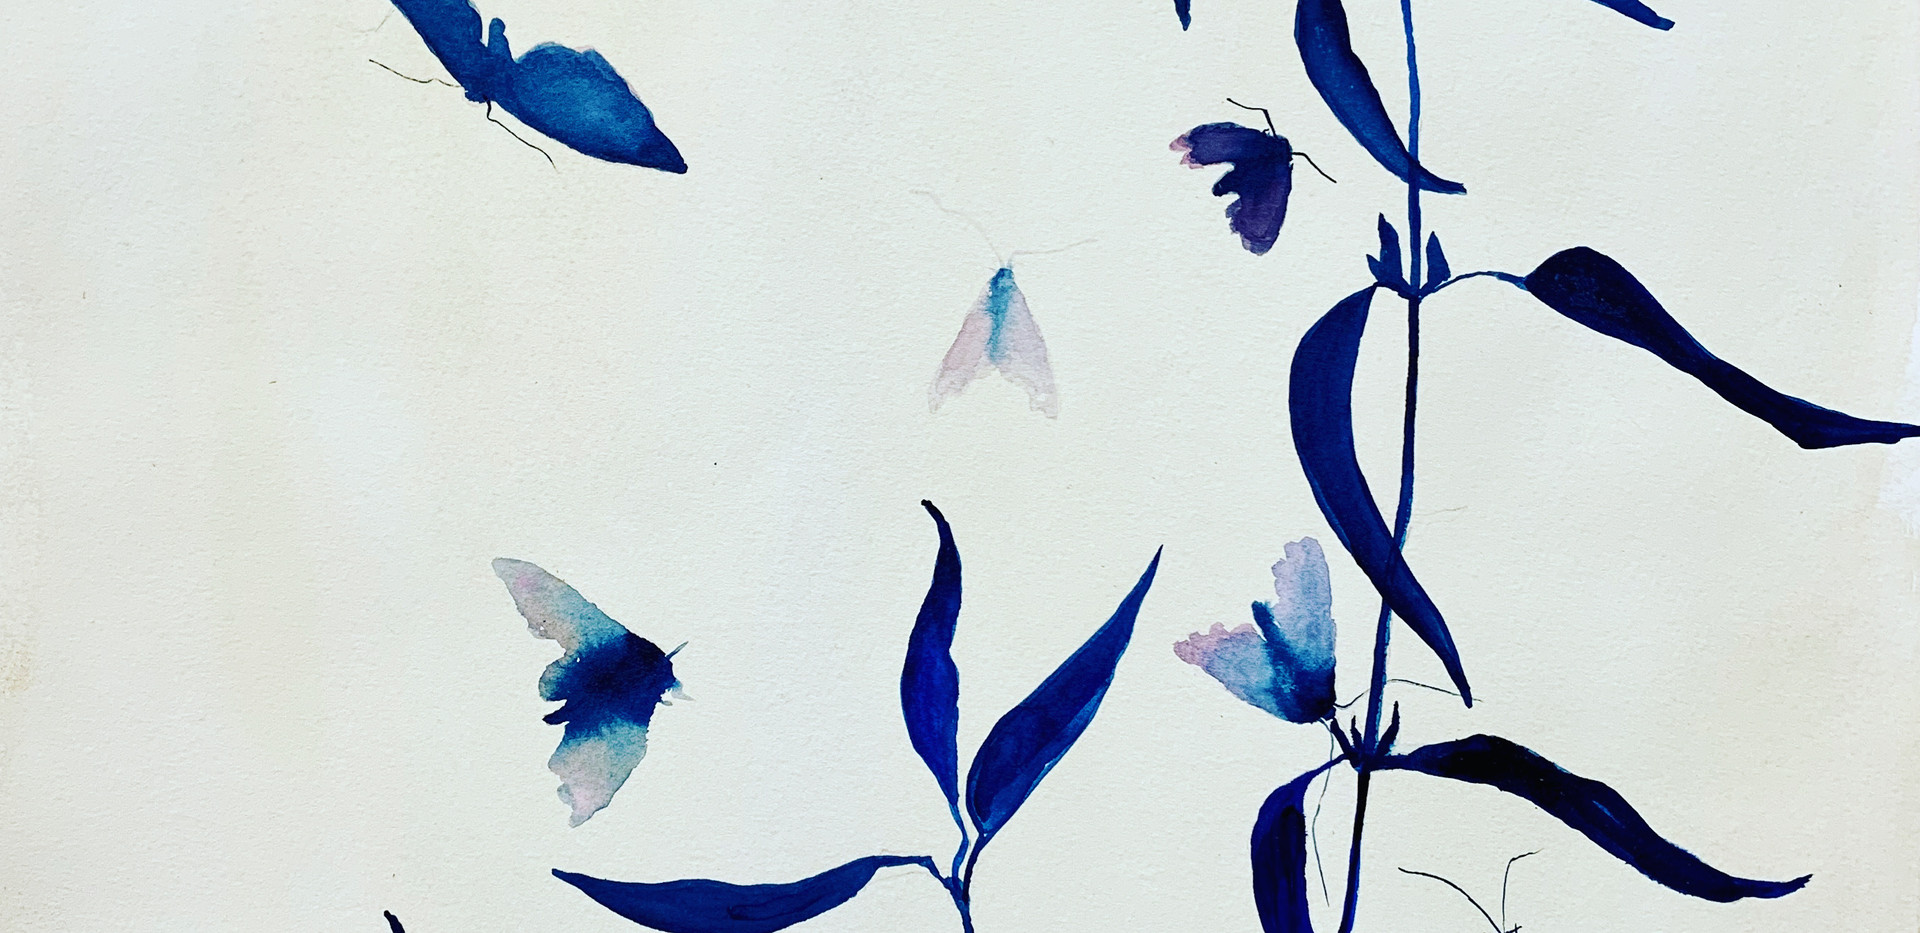 Moths Alight, 16x20, watercolor on paper, aluminum frame, $600